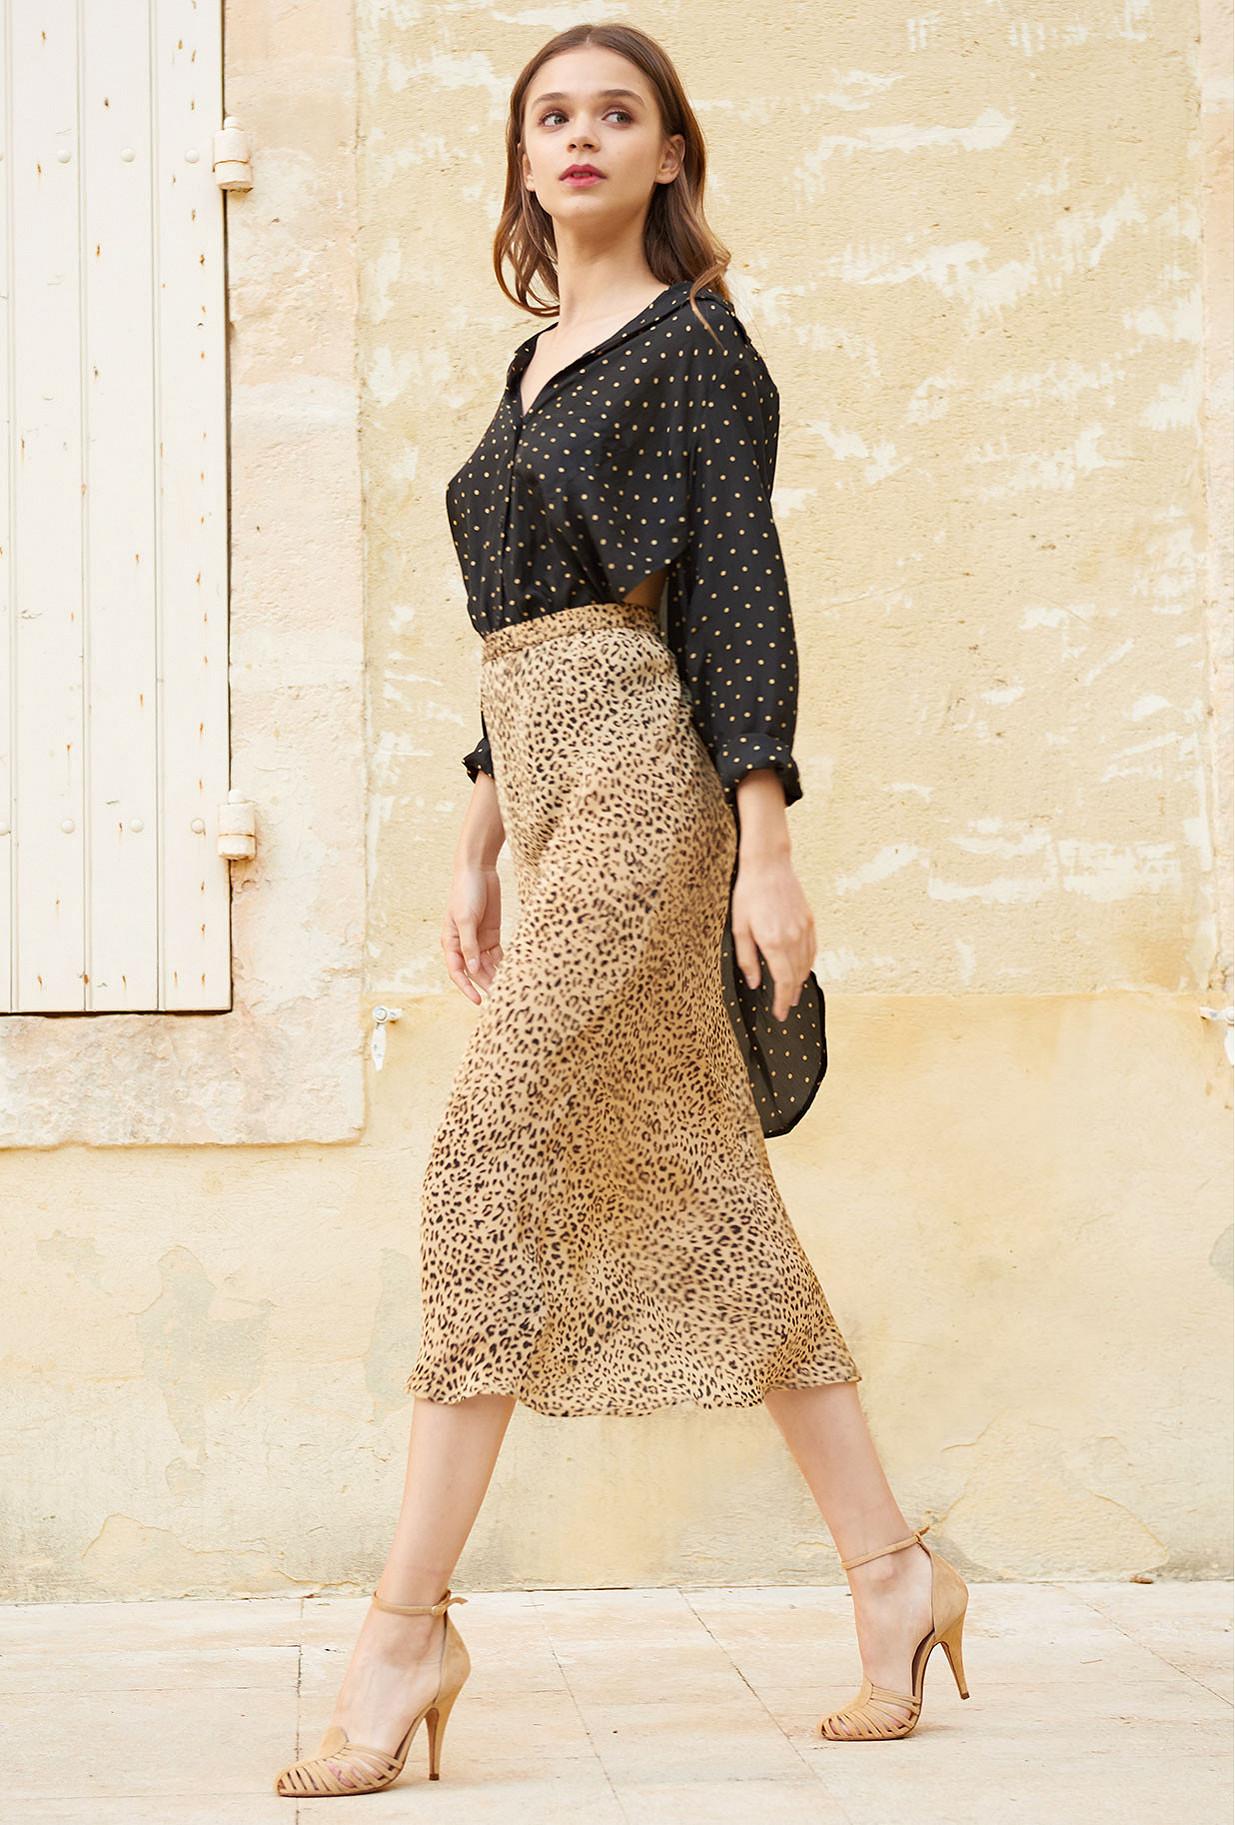 Paris clothes store Skirt  Roseton french designer fashion Paris